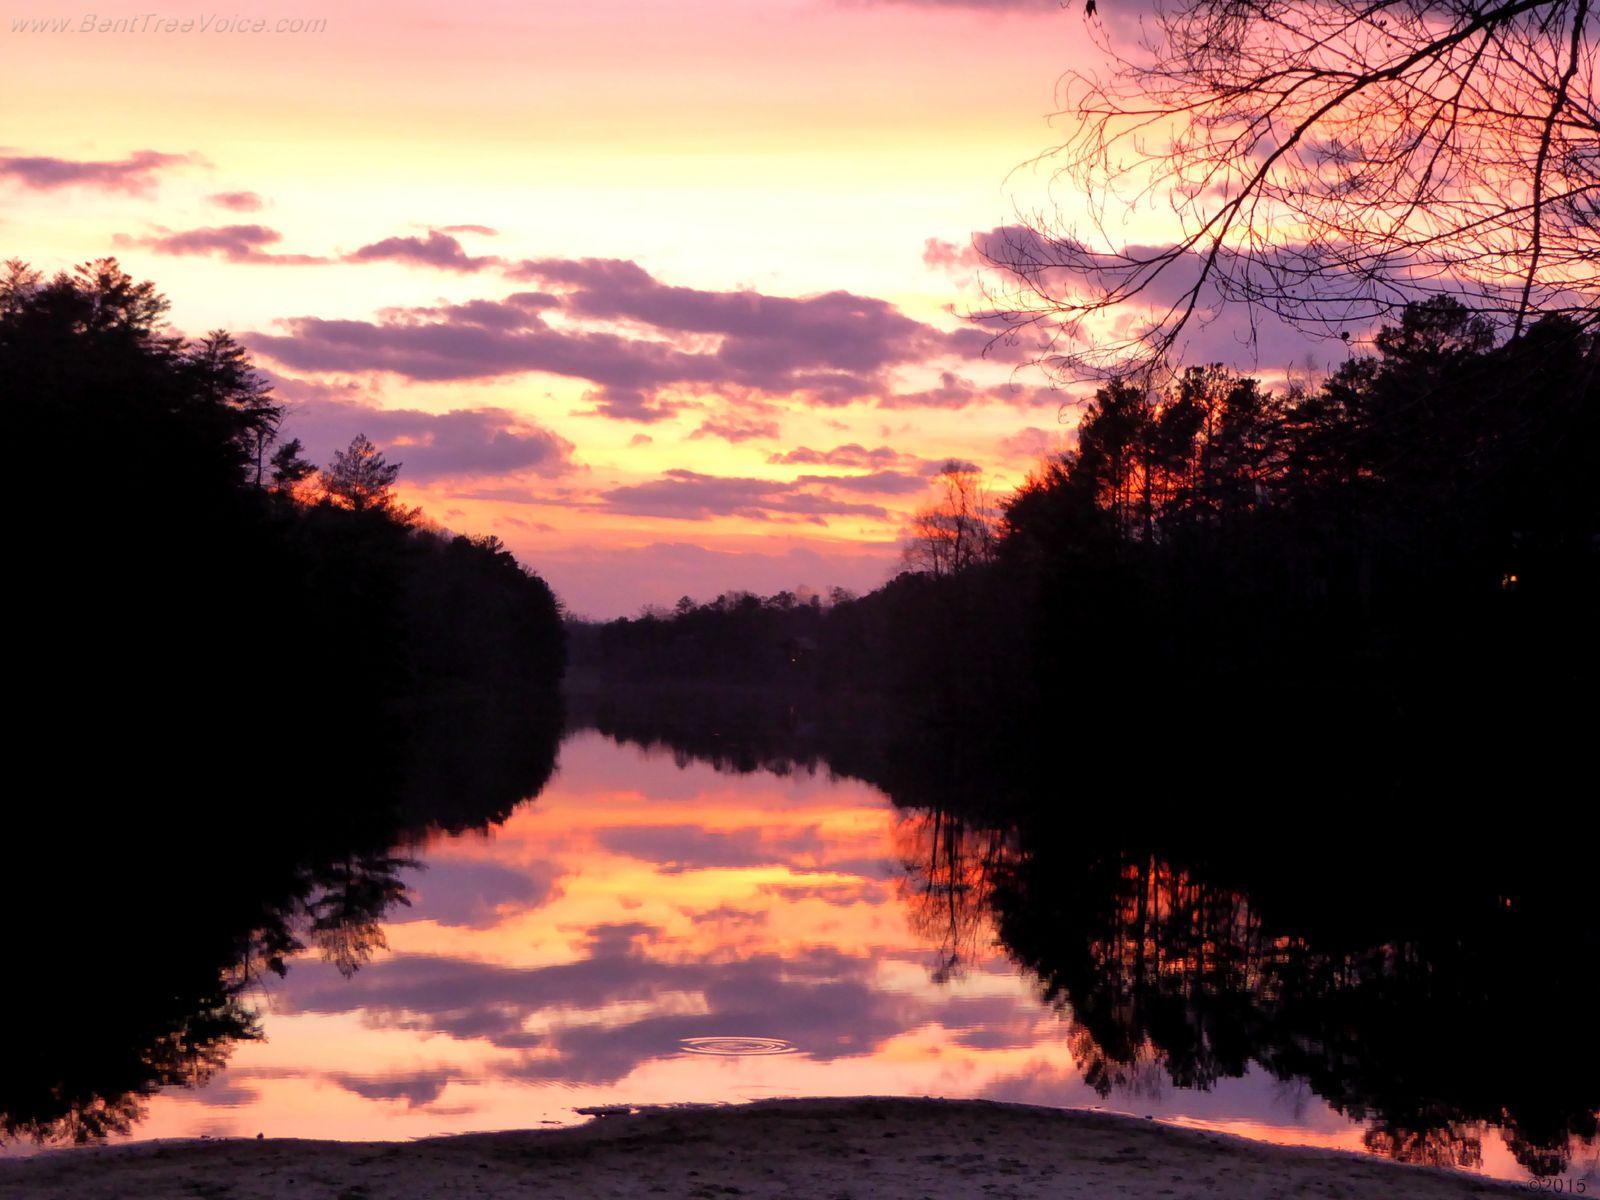 Sunset at Lake Tamarack in Bent Tree